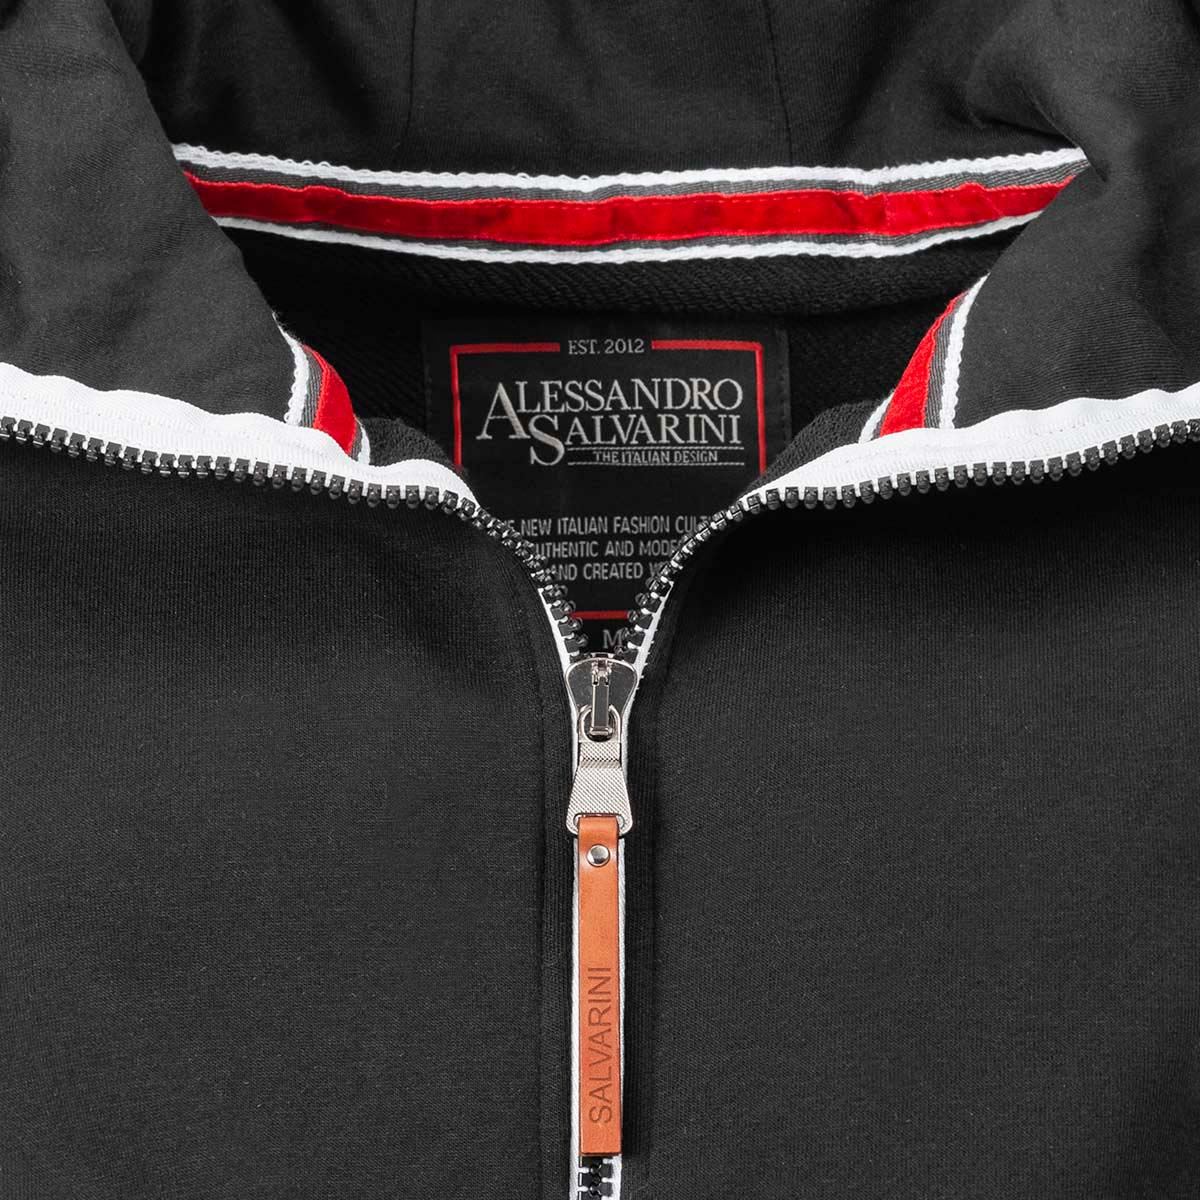 A-Salvarini-Herren-Sweatjacke-Kapuzenpullover-Jacke-Kapuze-Hoodie-Sweater-AS192 Indexbild 46